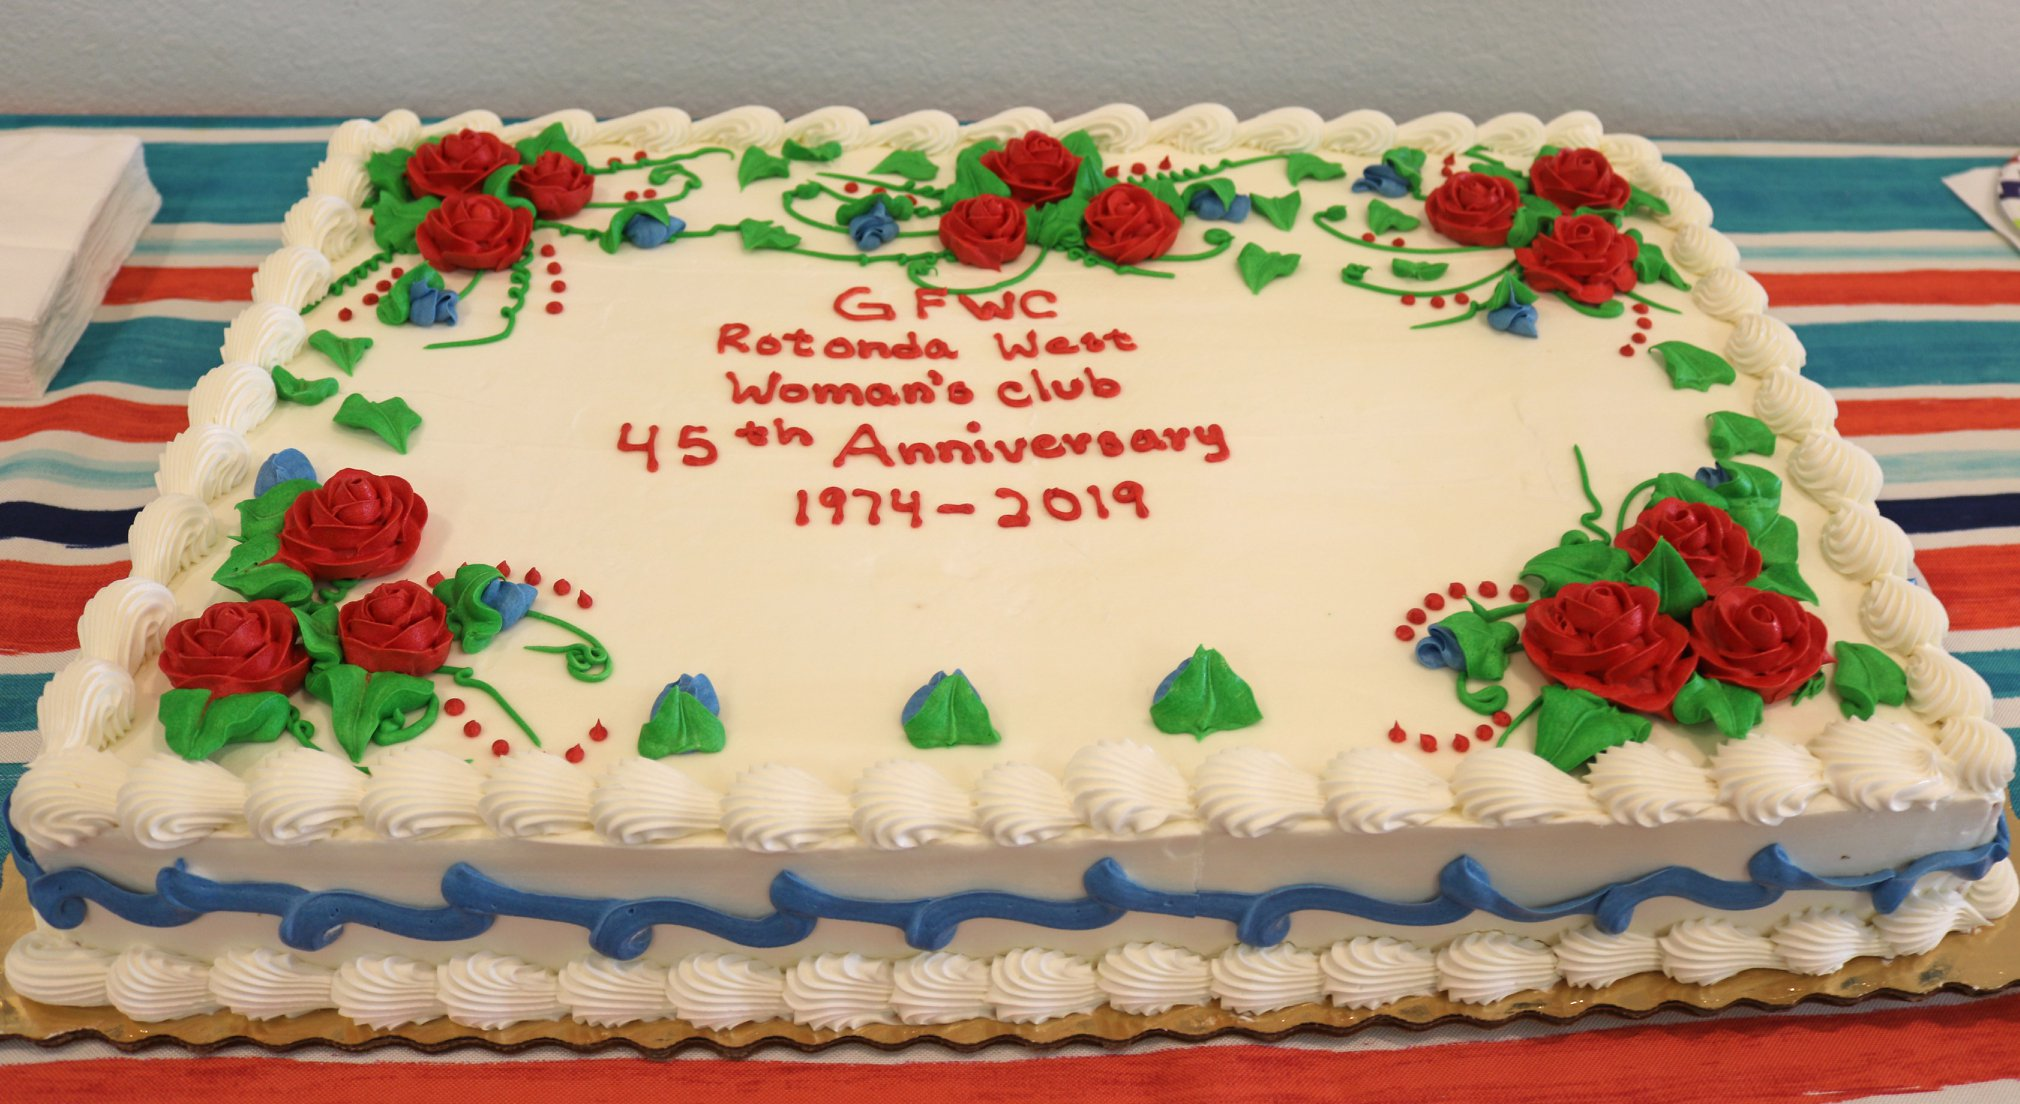 Our 45th Club Anniversary as GFWC Rotonda West Woman's Club.